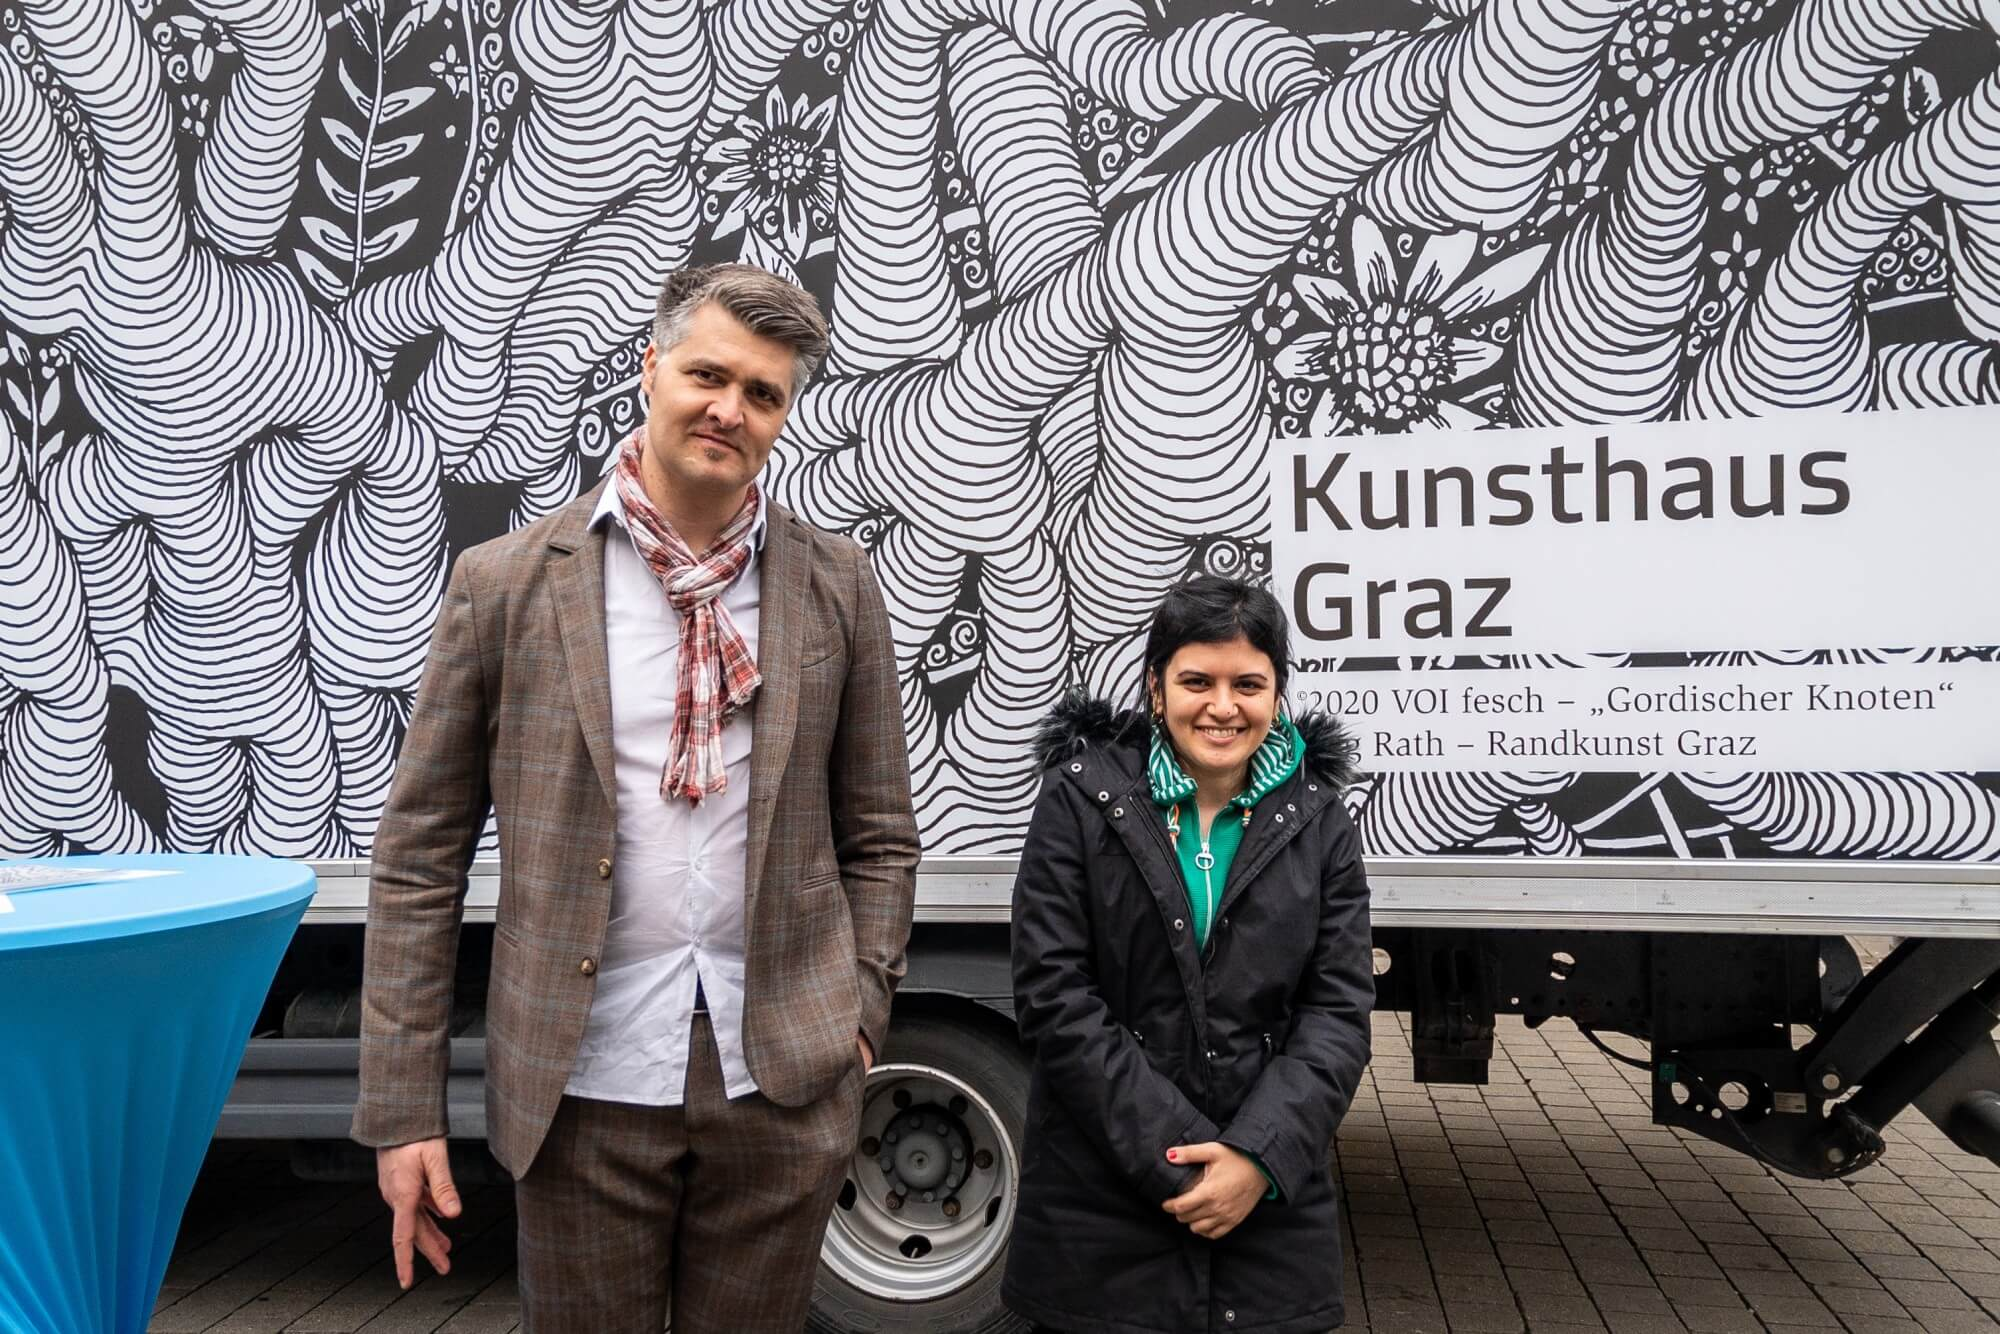 Künstler Jörg Rath und Künstlerin Juka Abdilwahid